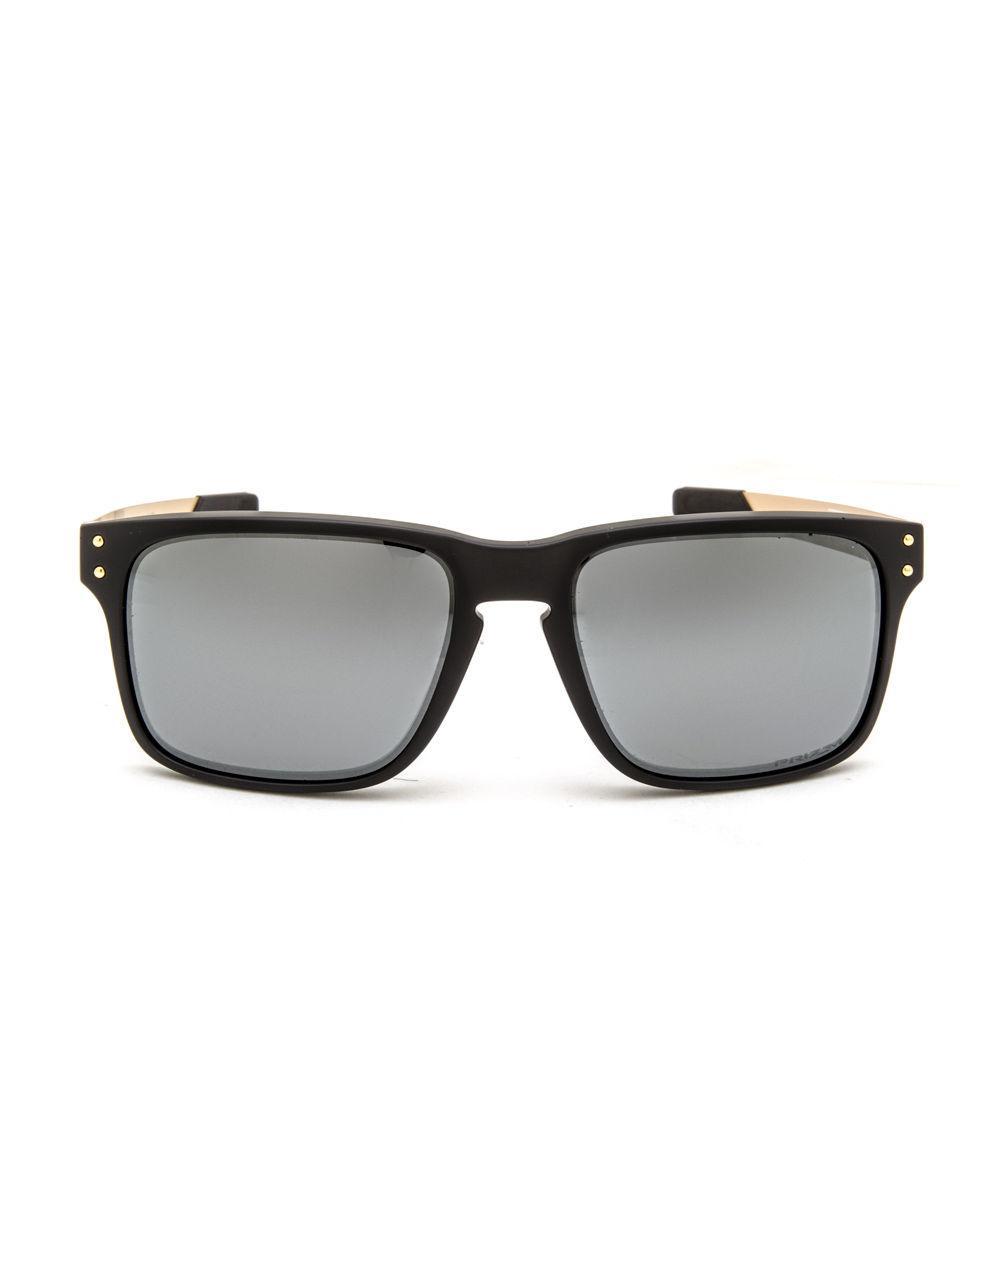 2dbfafe3a1635 Oakley Holbrook Mix Matte Black   Prizm Black Polarized Sunglasses in Black  for Men - Lyst